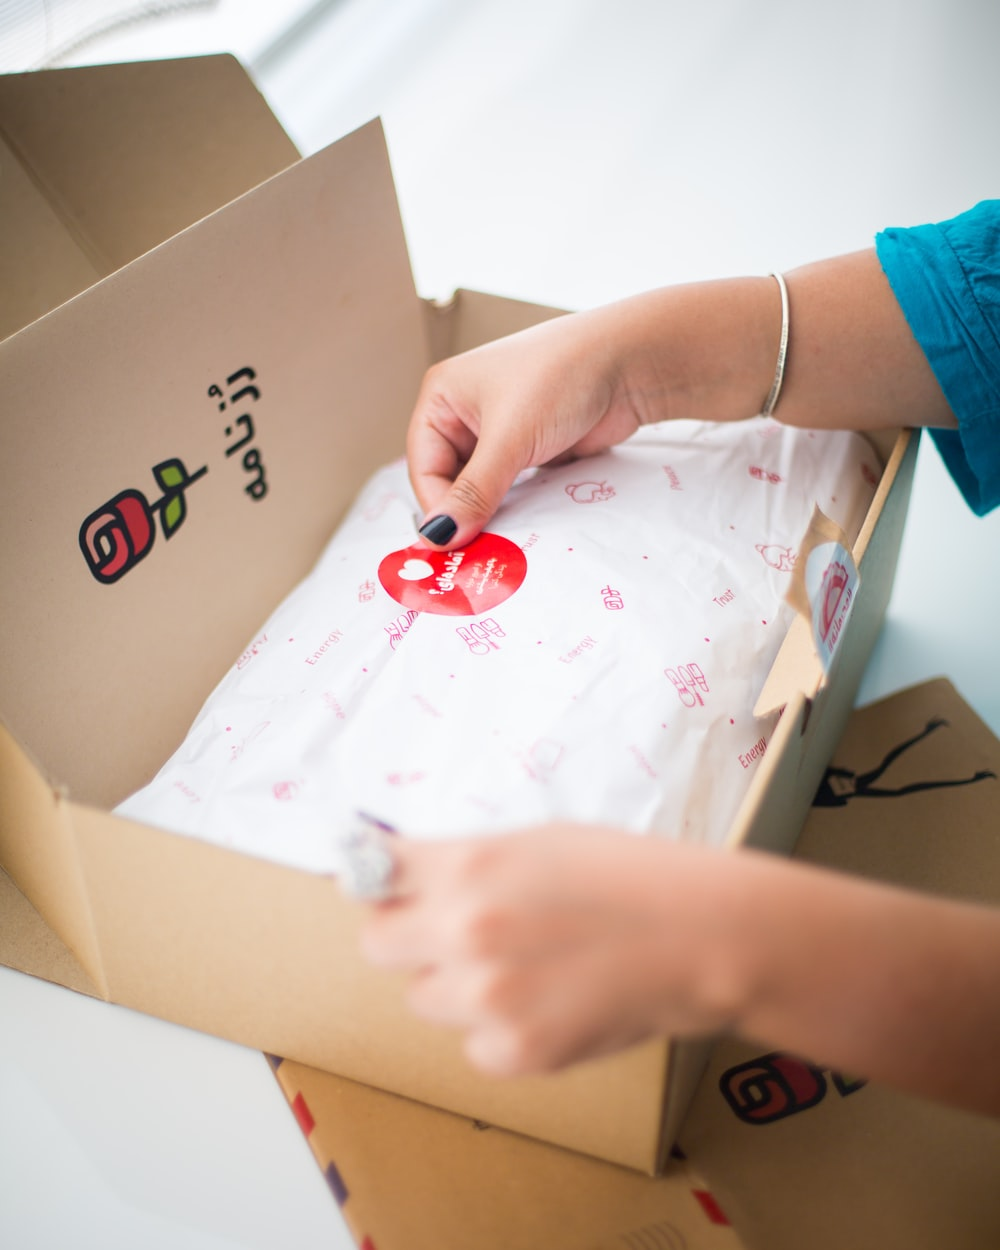 person sticking sticker on box